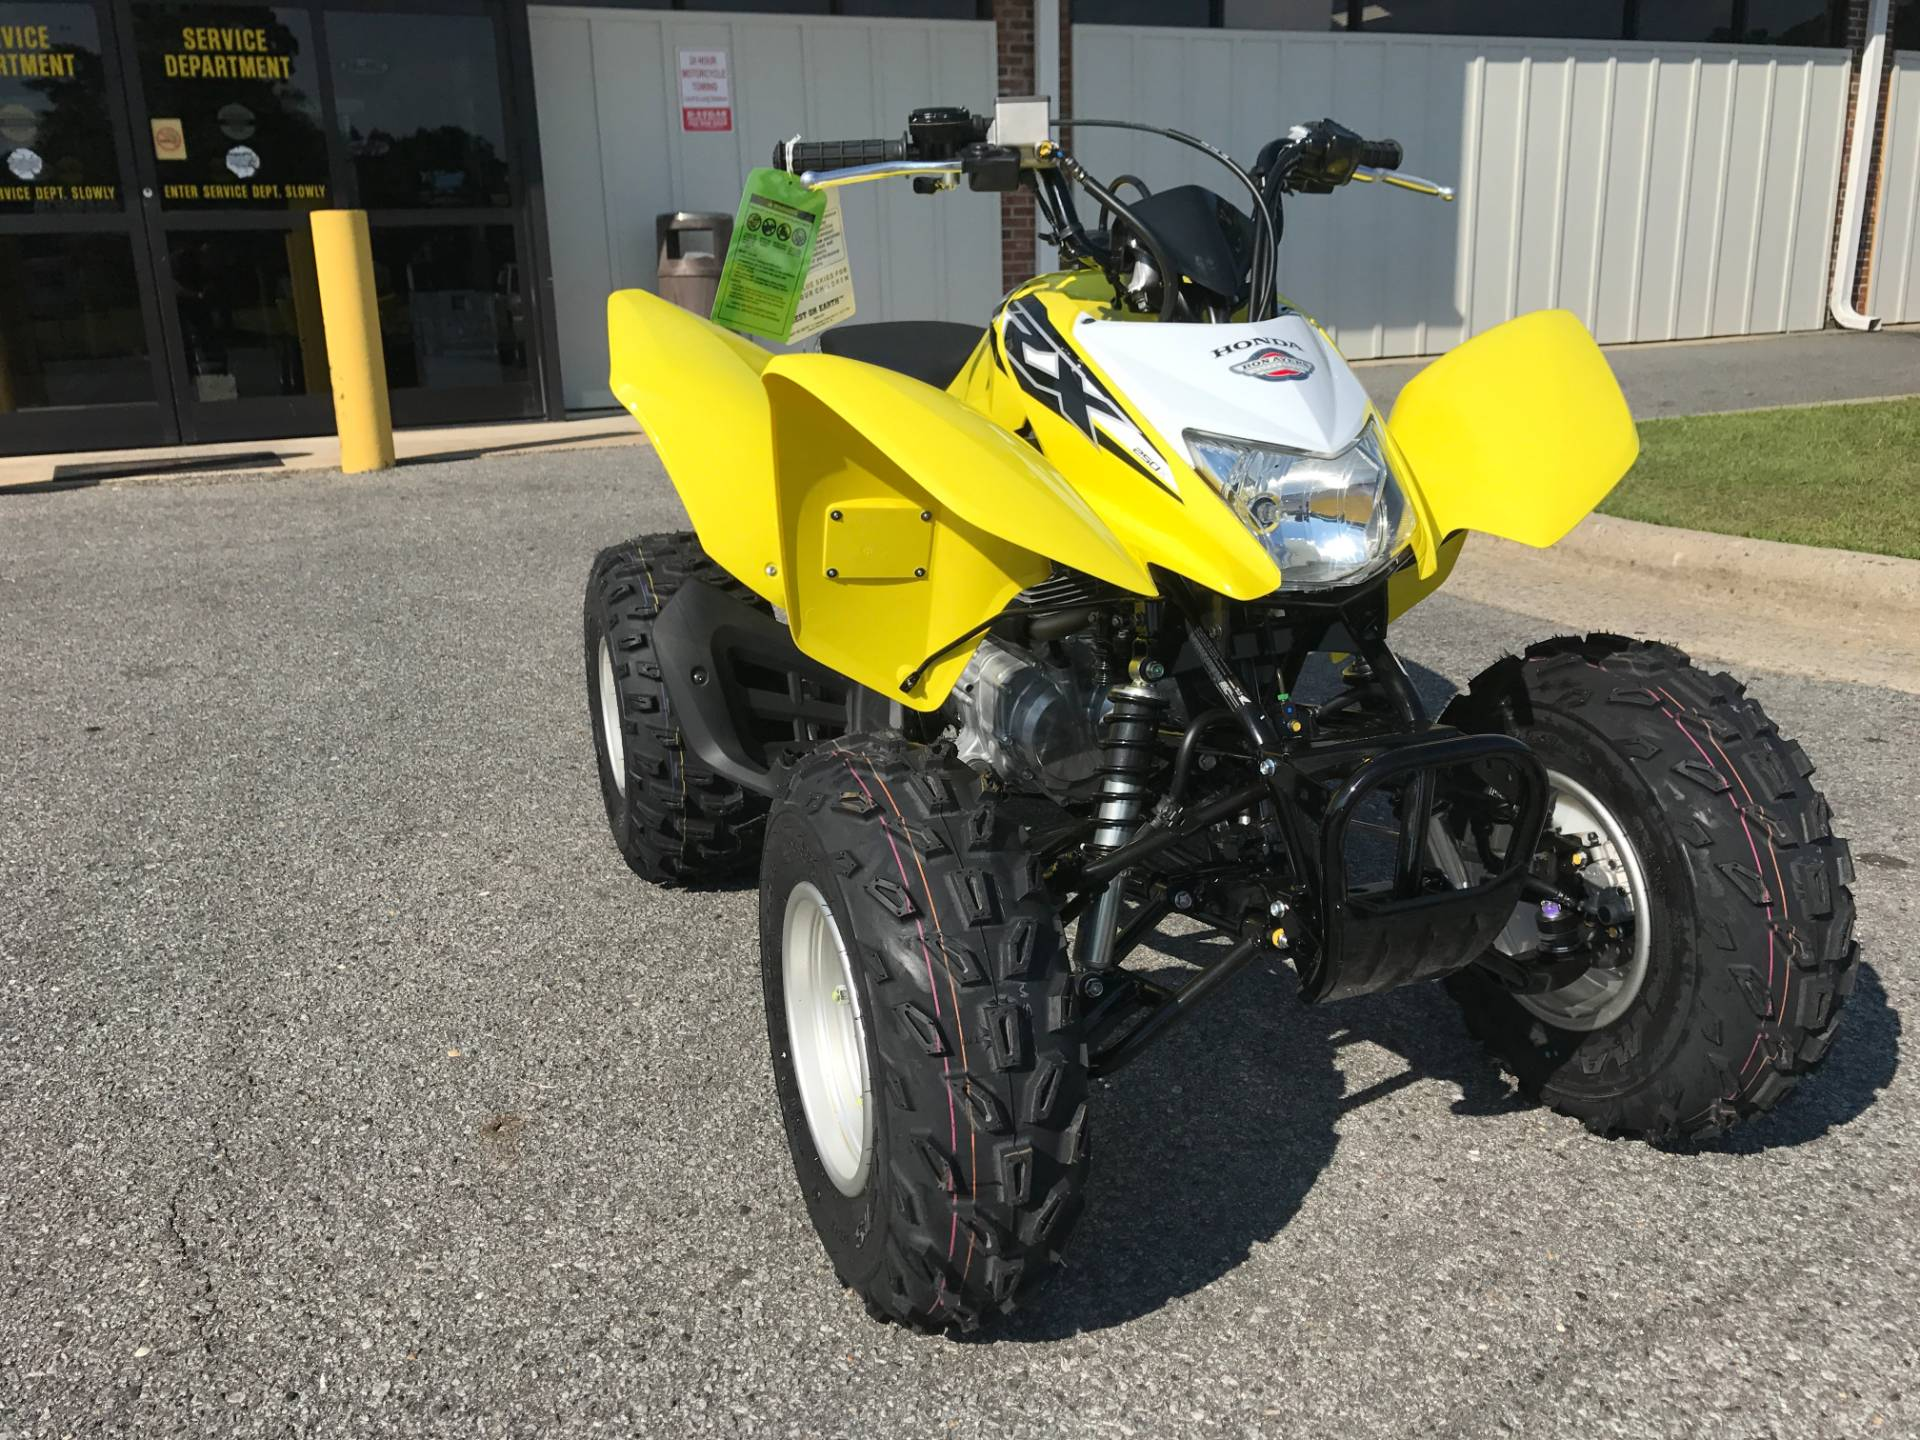 New 2018 Honda TRX250X ATVs in Greenville, NC | Stock ...